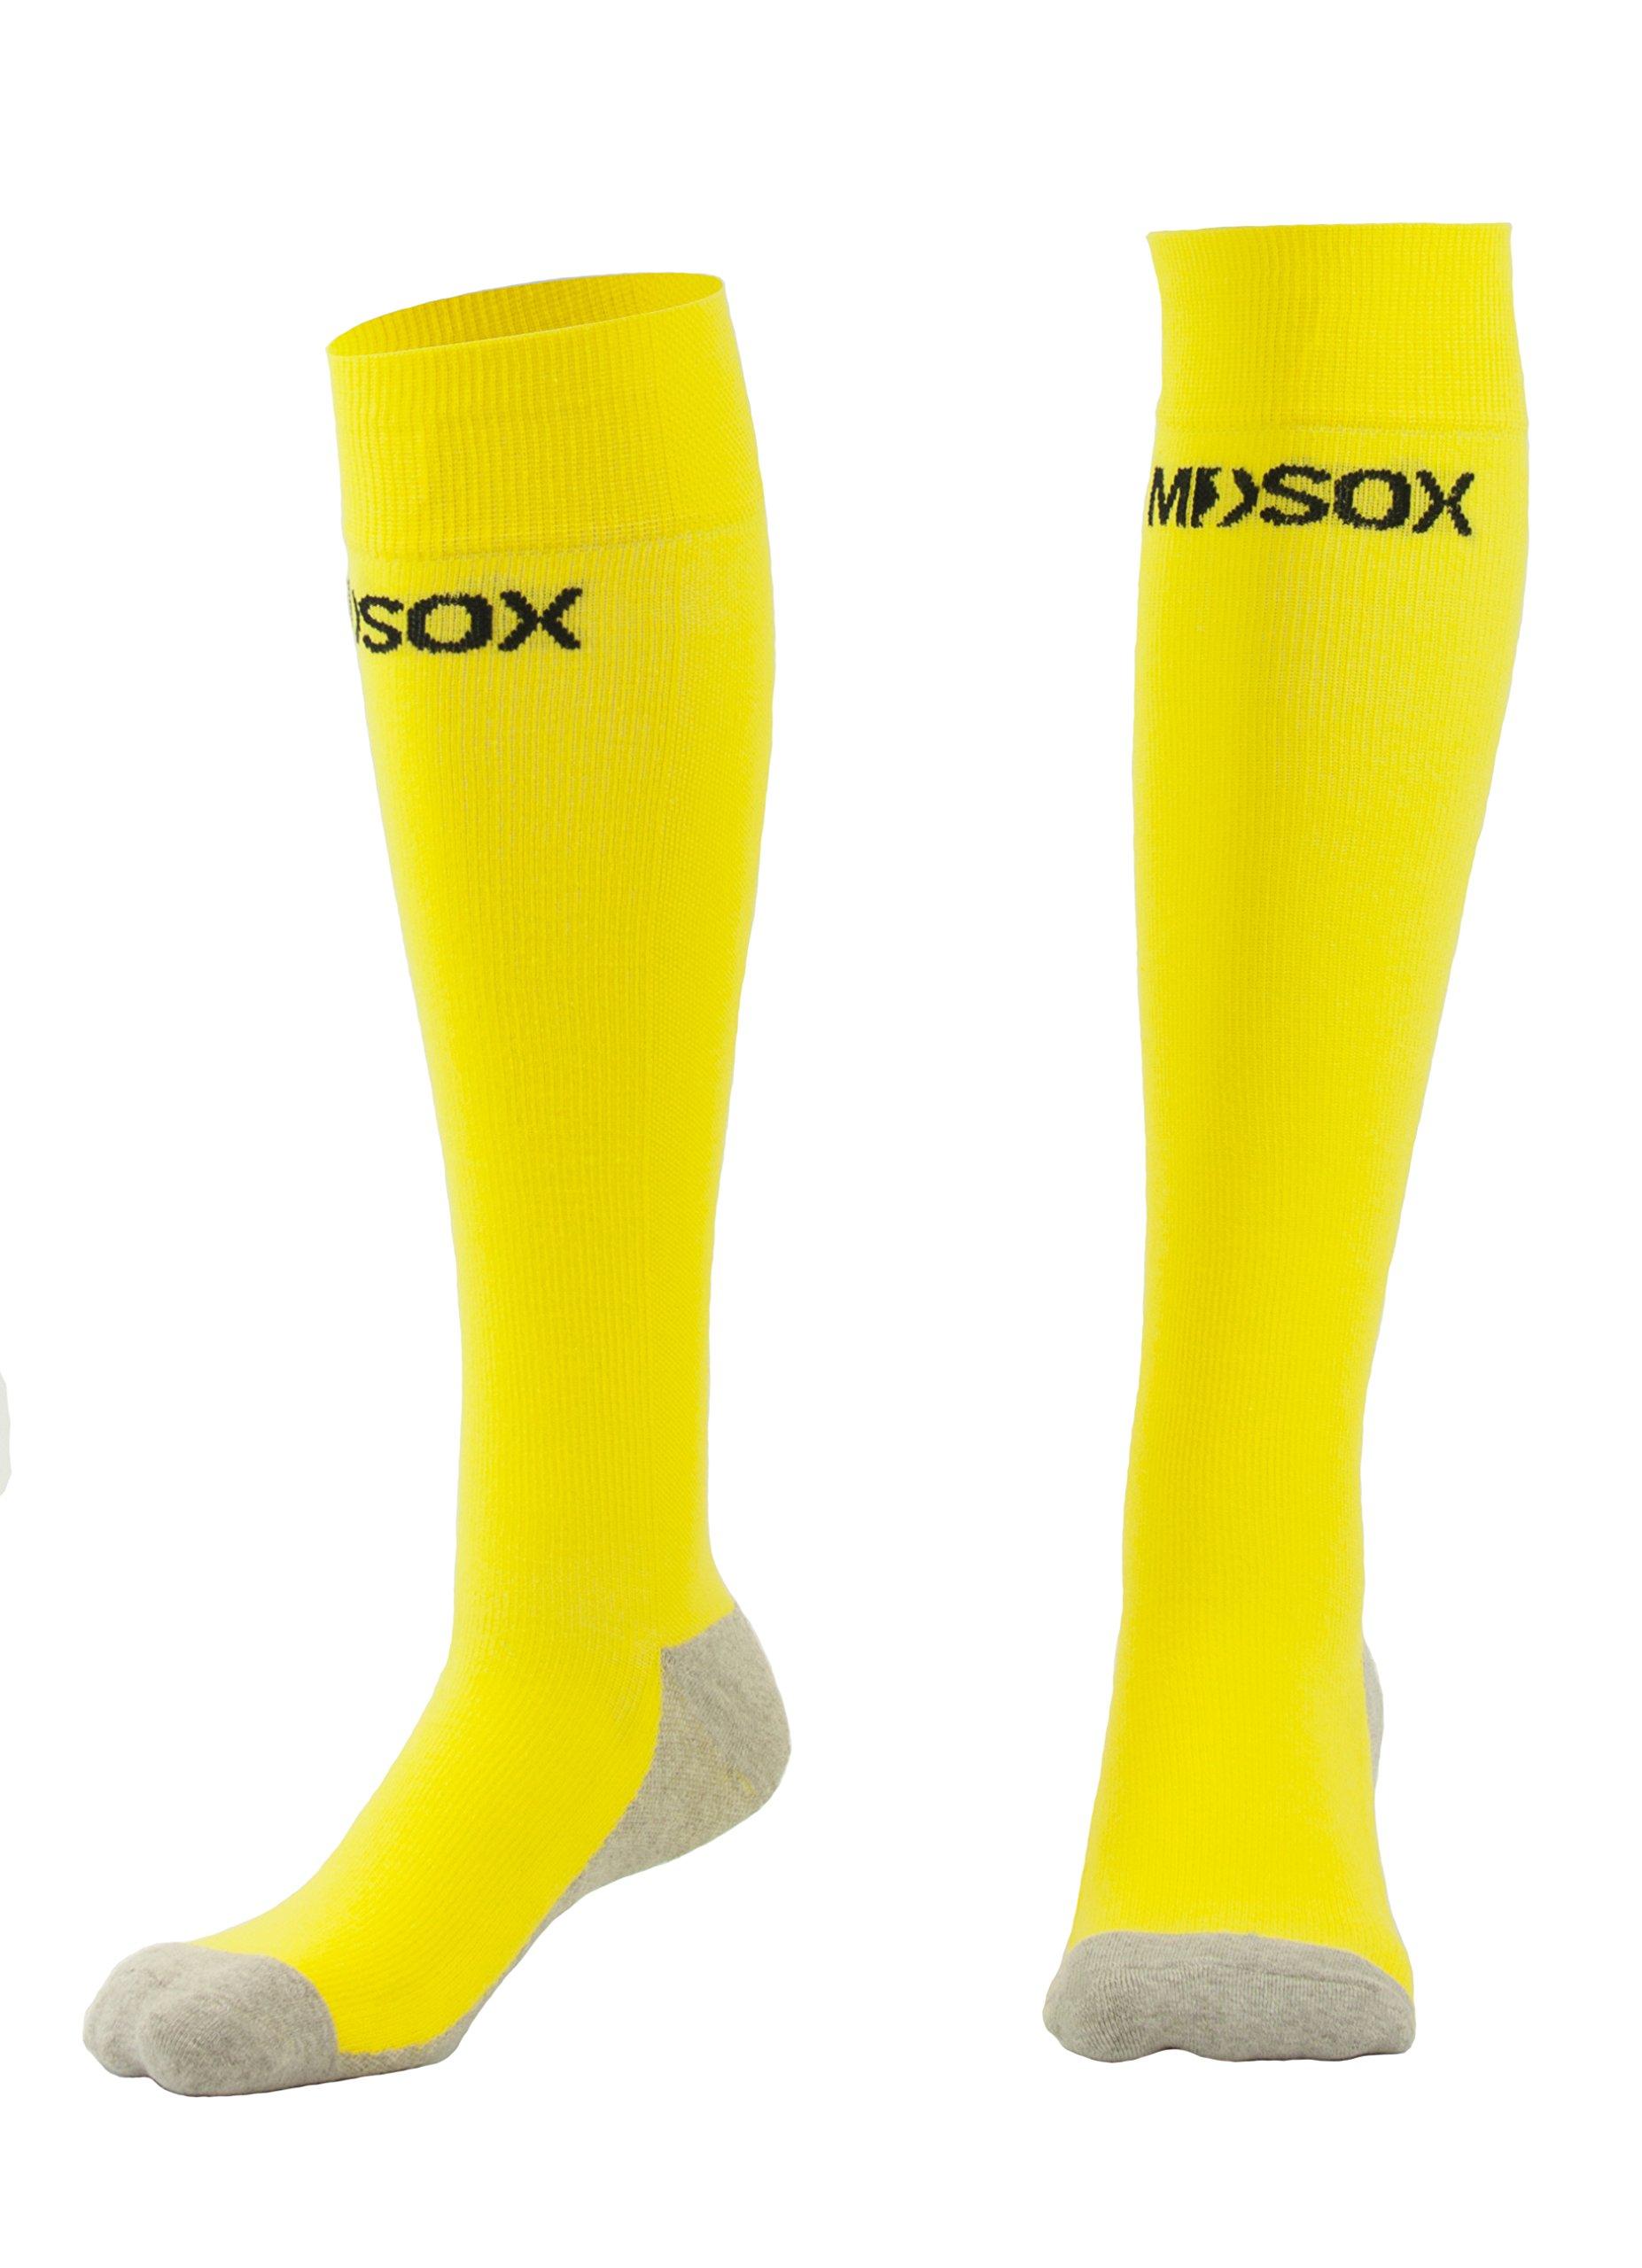 fb78e91807 Graduated Compression Socks for Men & Women MDSOX 20-30 mmHg (Yellow, XXL